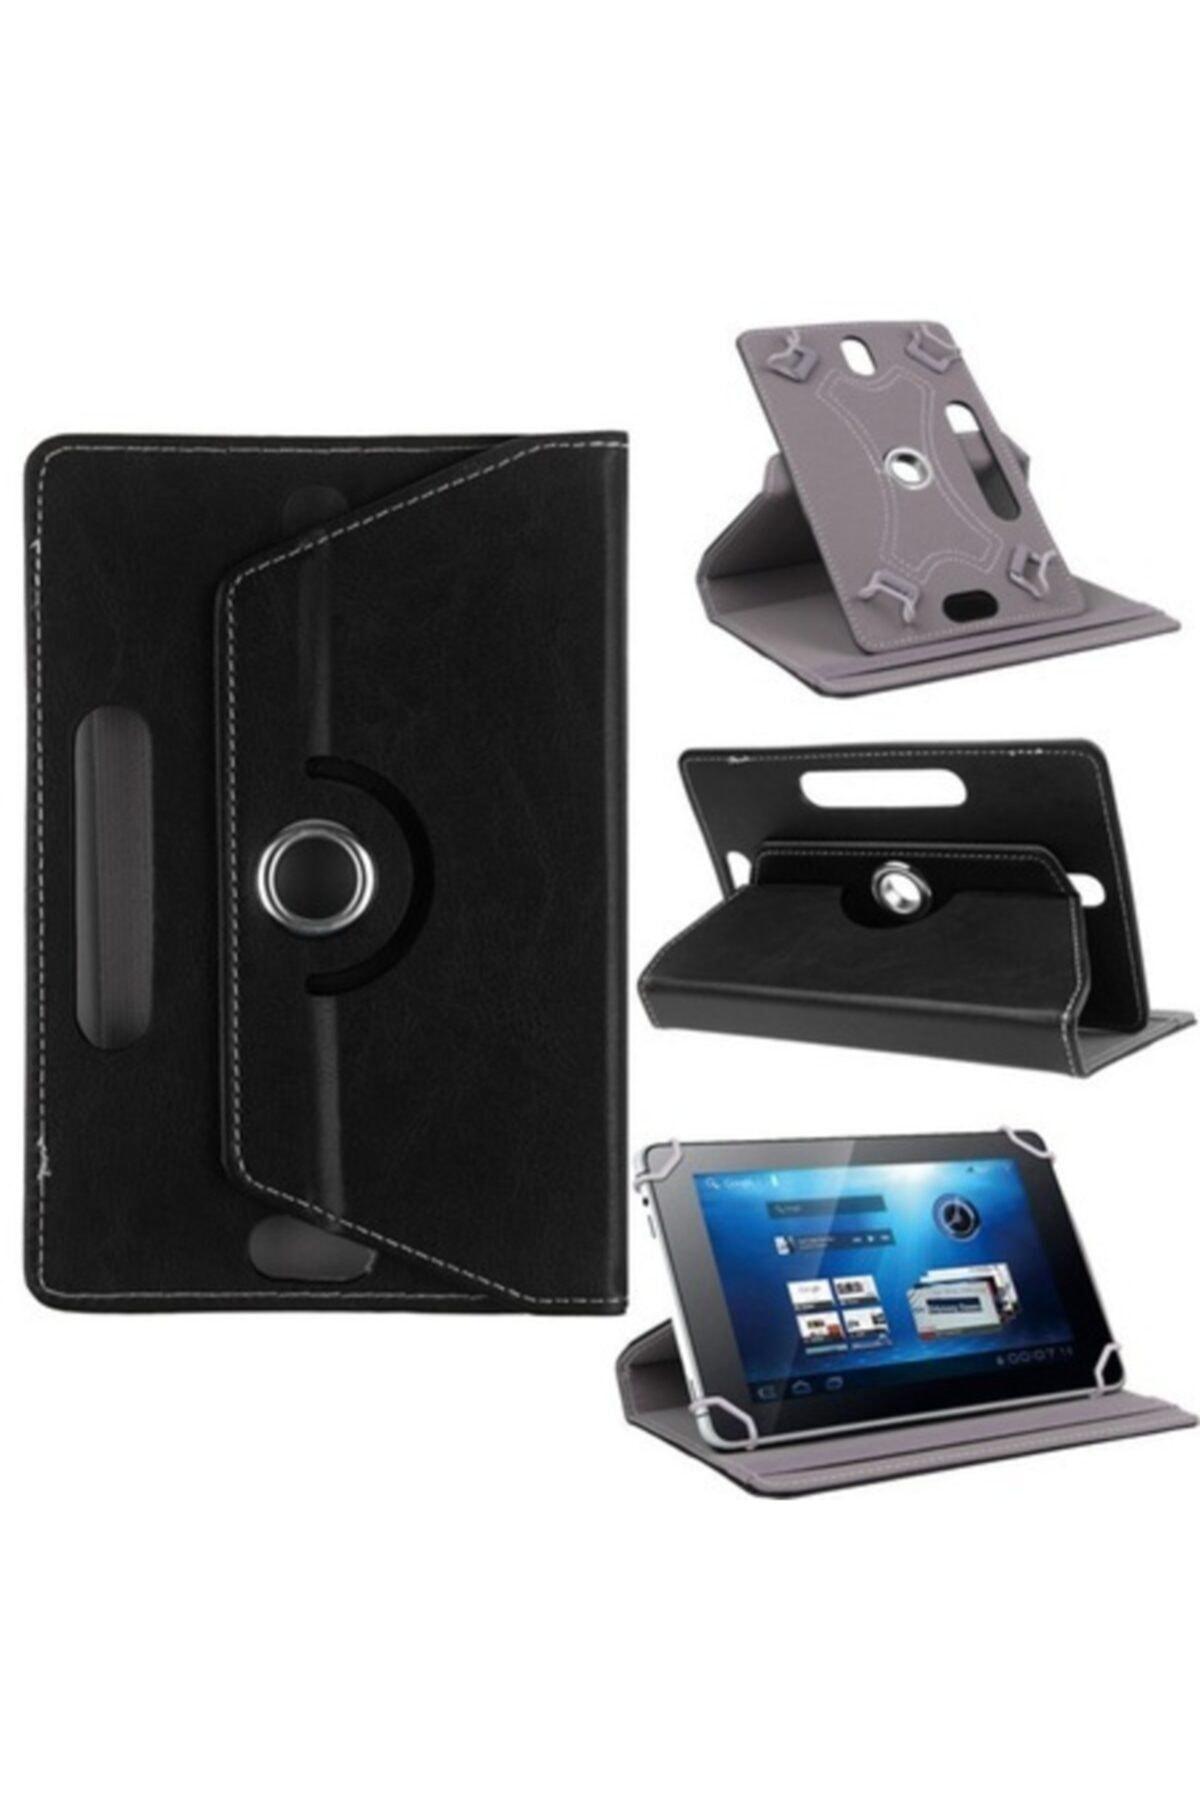 "Vorcom Sx Pro 10"" Dönebilen Standlı Tablet Kılıfı - Siyah"